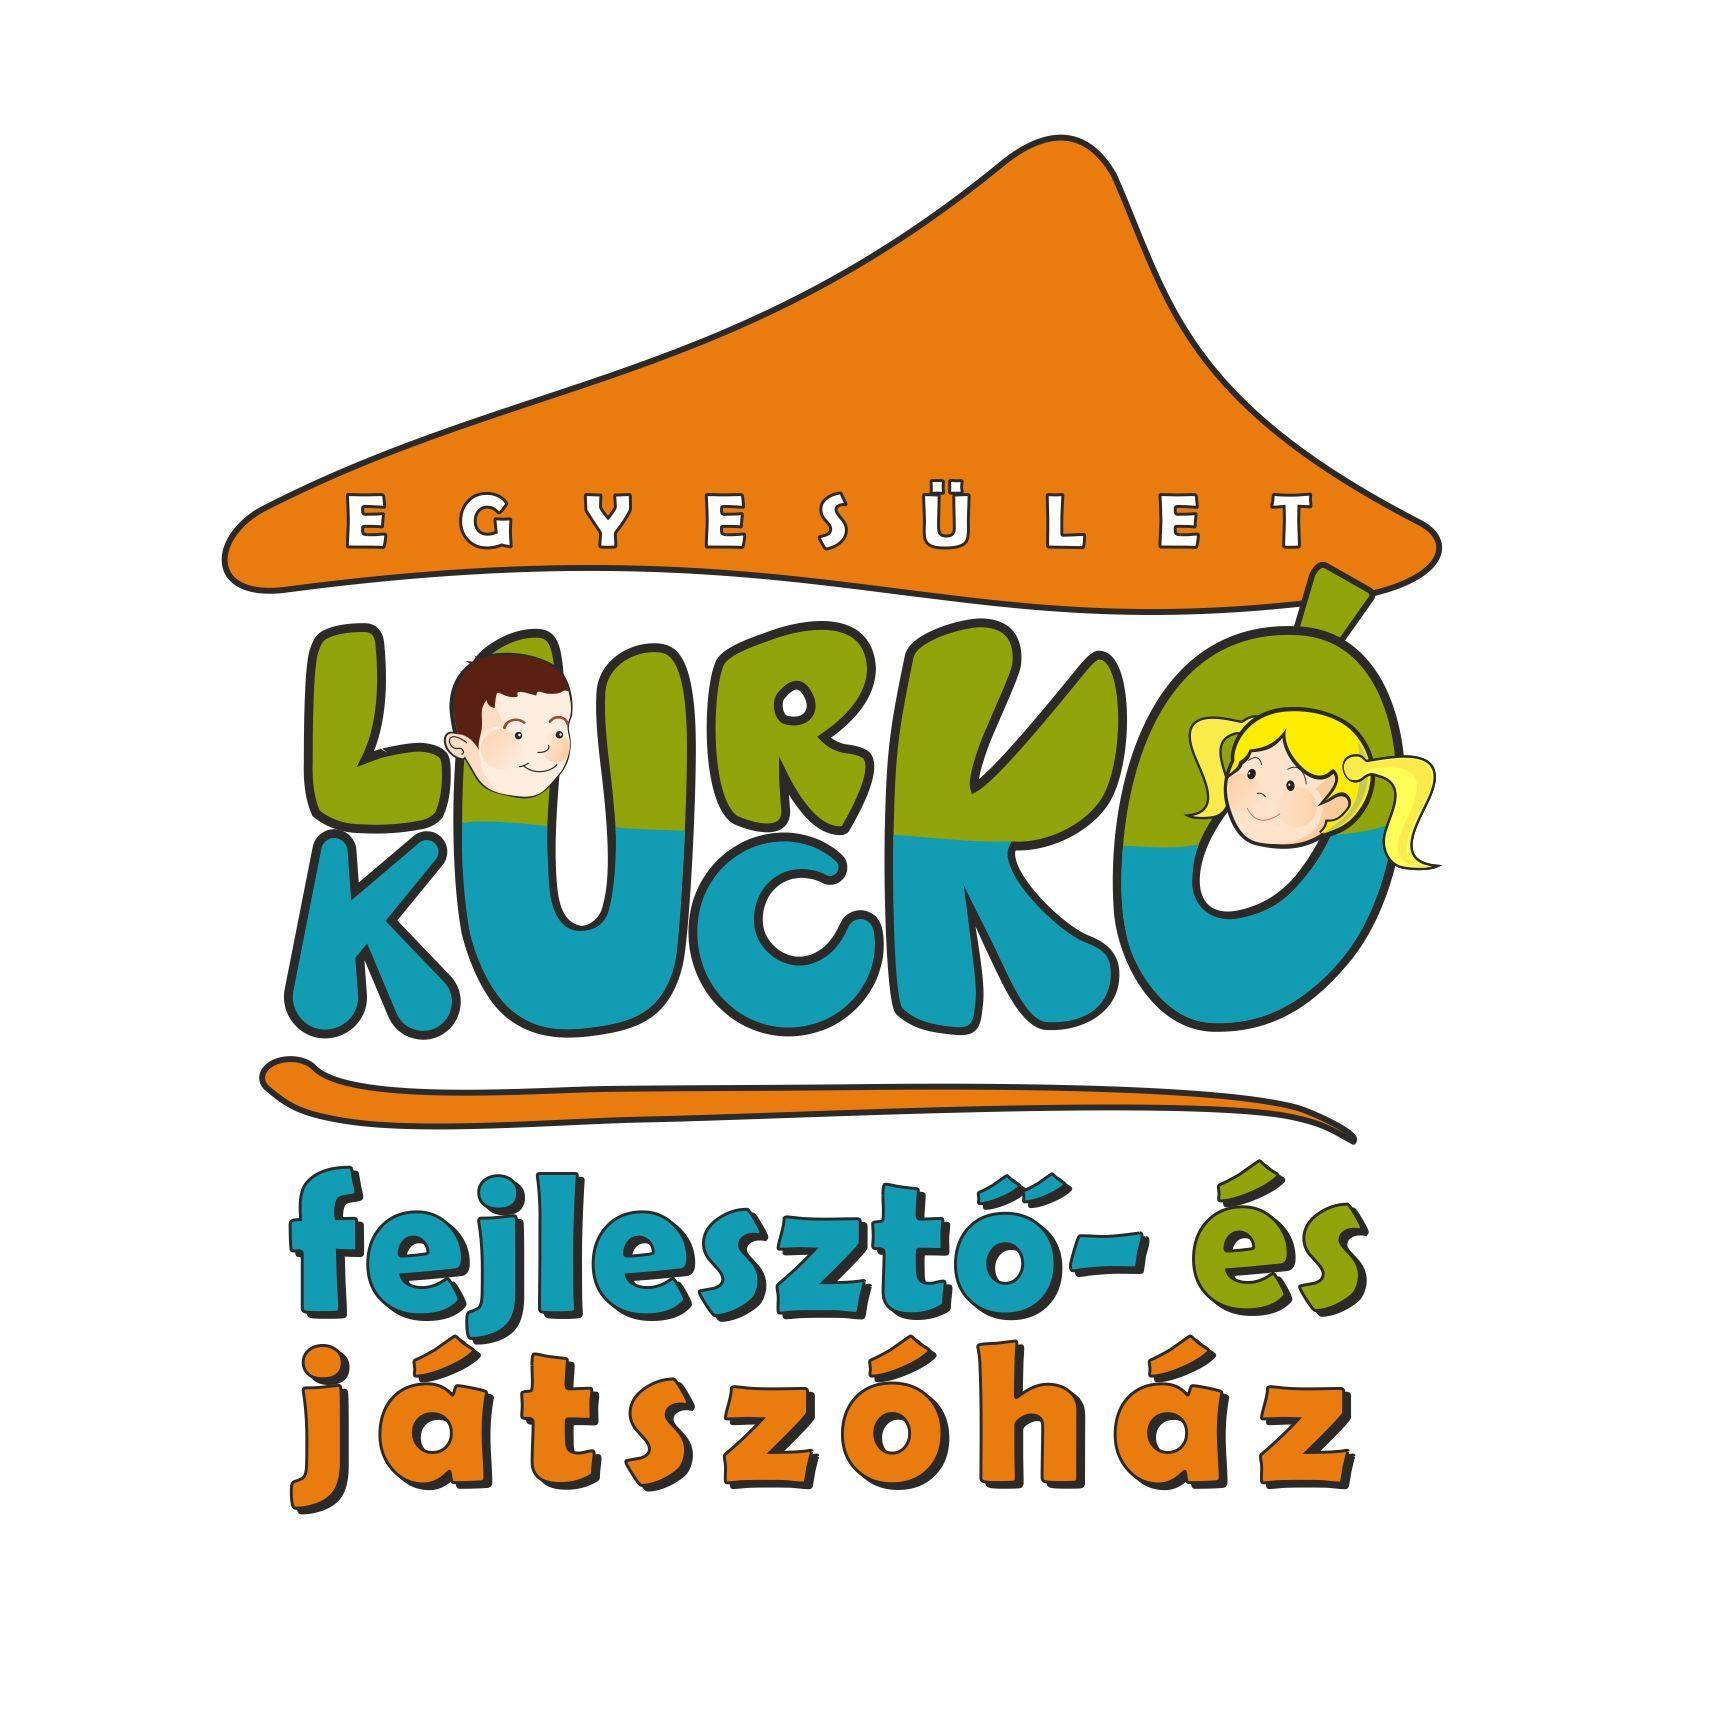 Asociația Lurko-kucko logo